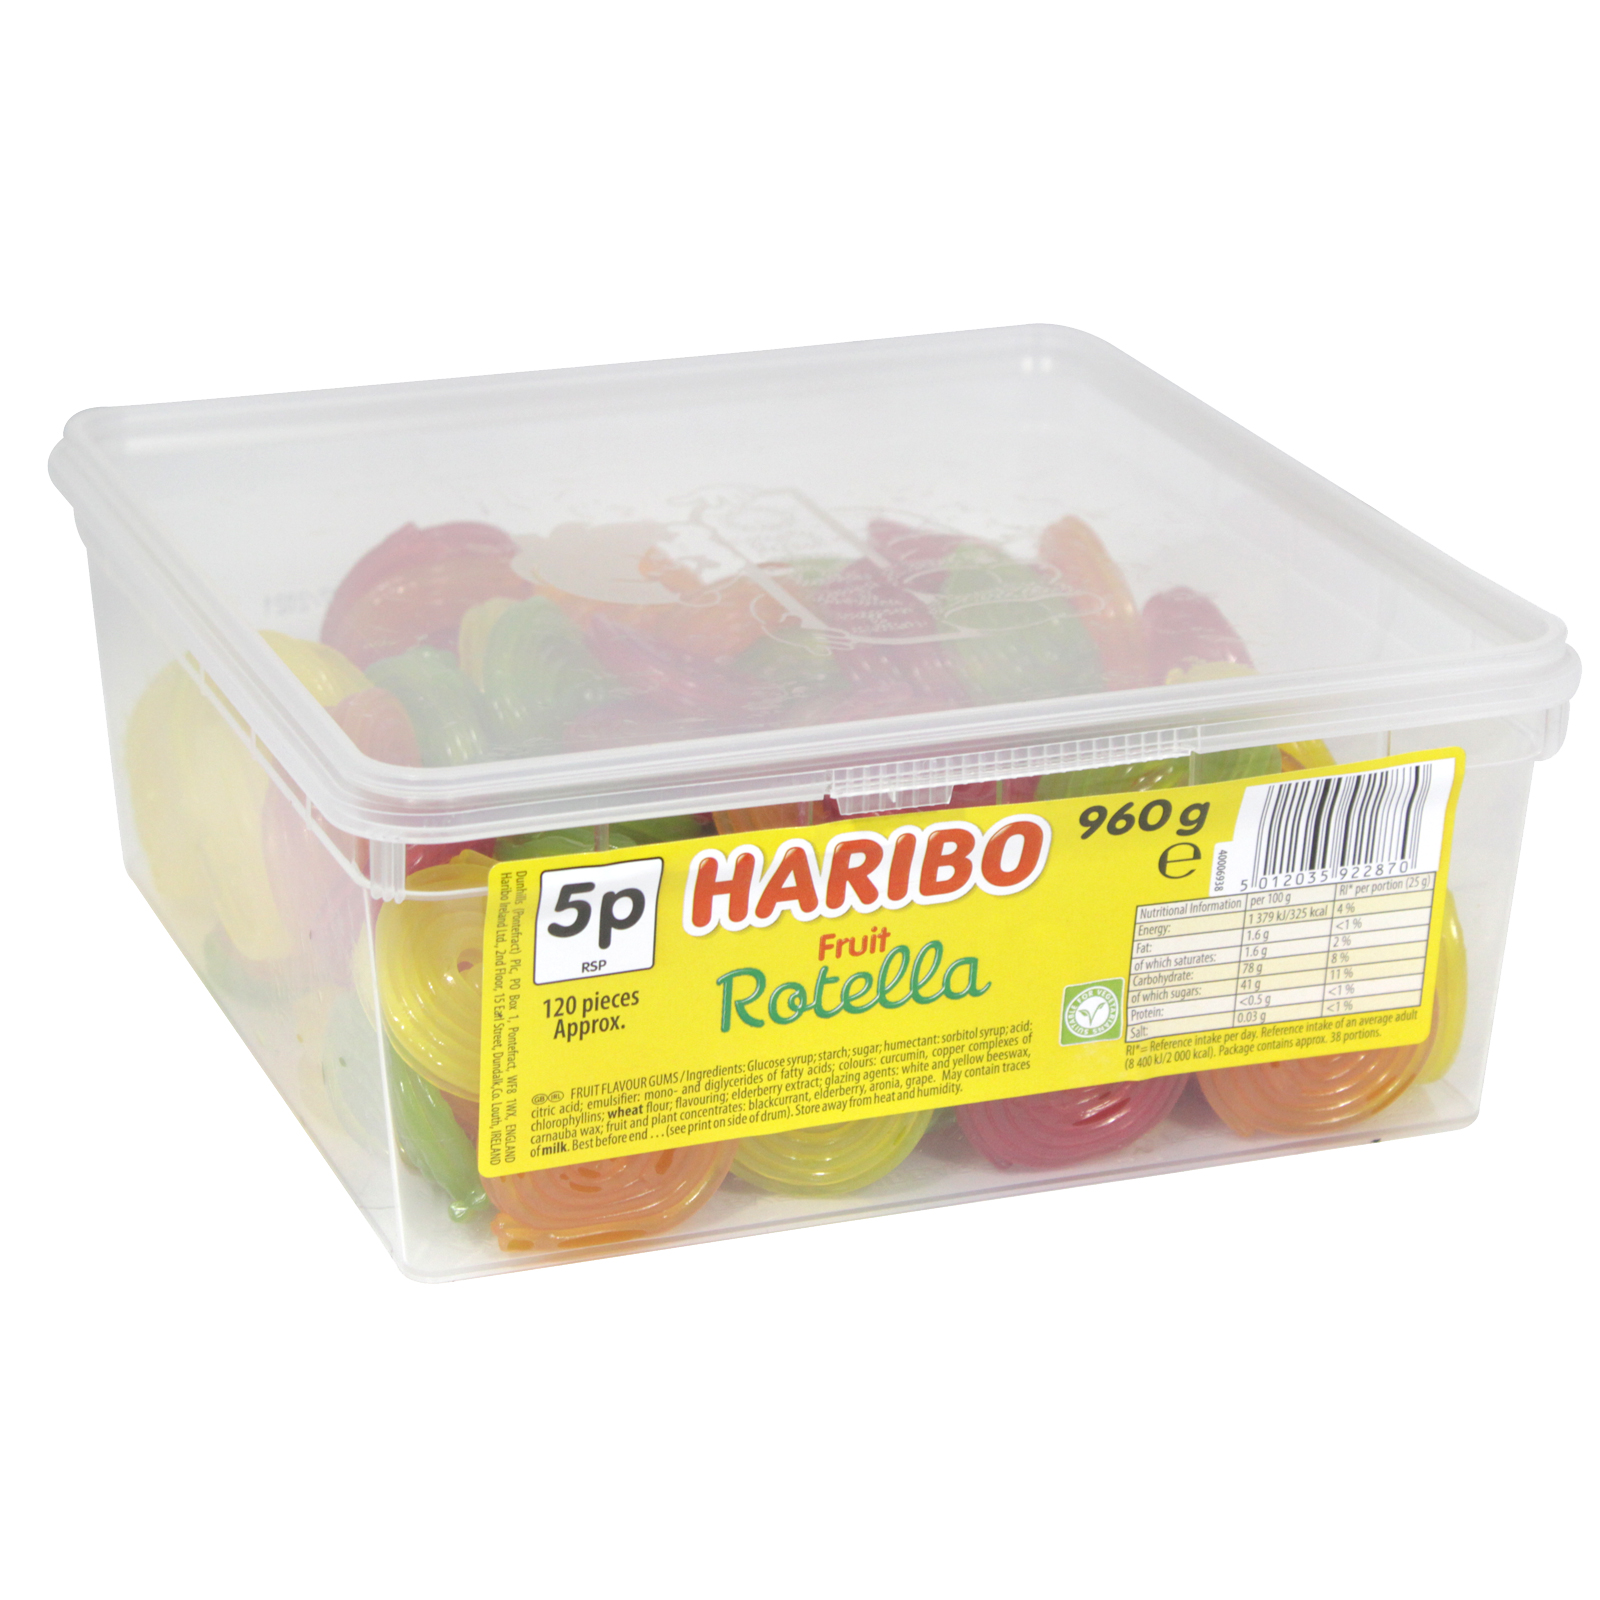 HARIBO ROTELLA DRUM 960G APPROX 120 PIECES